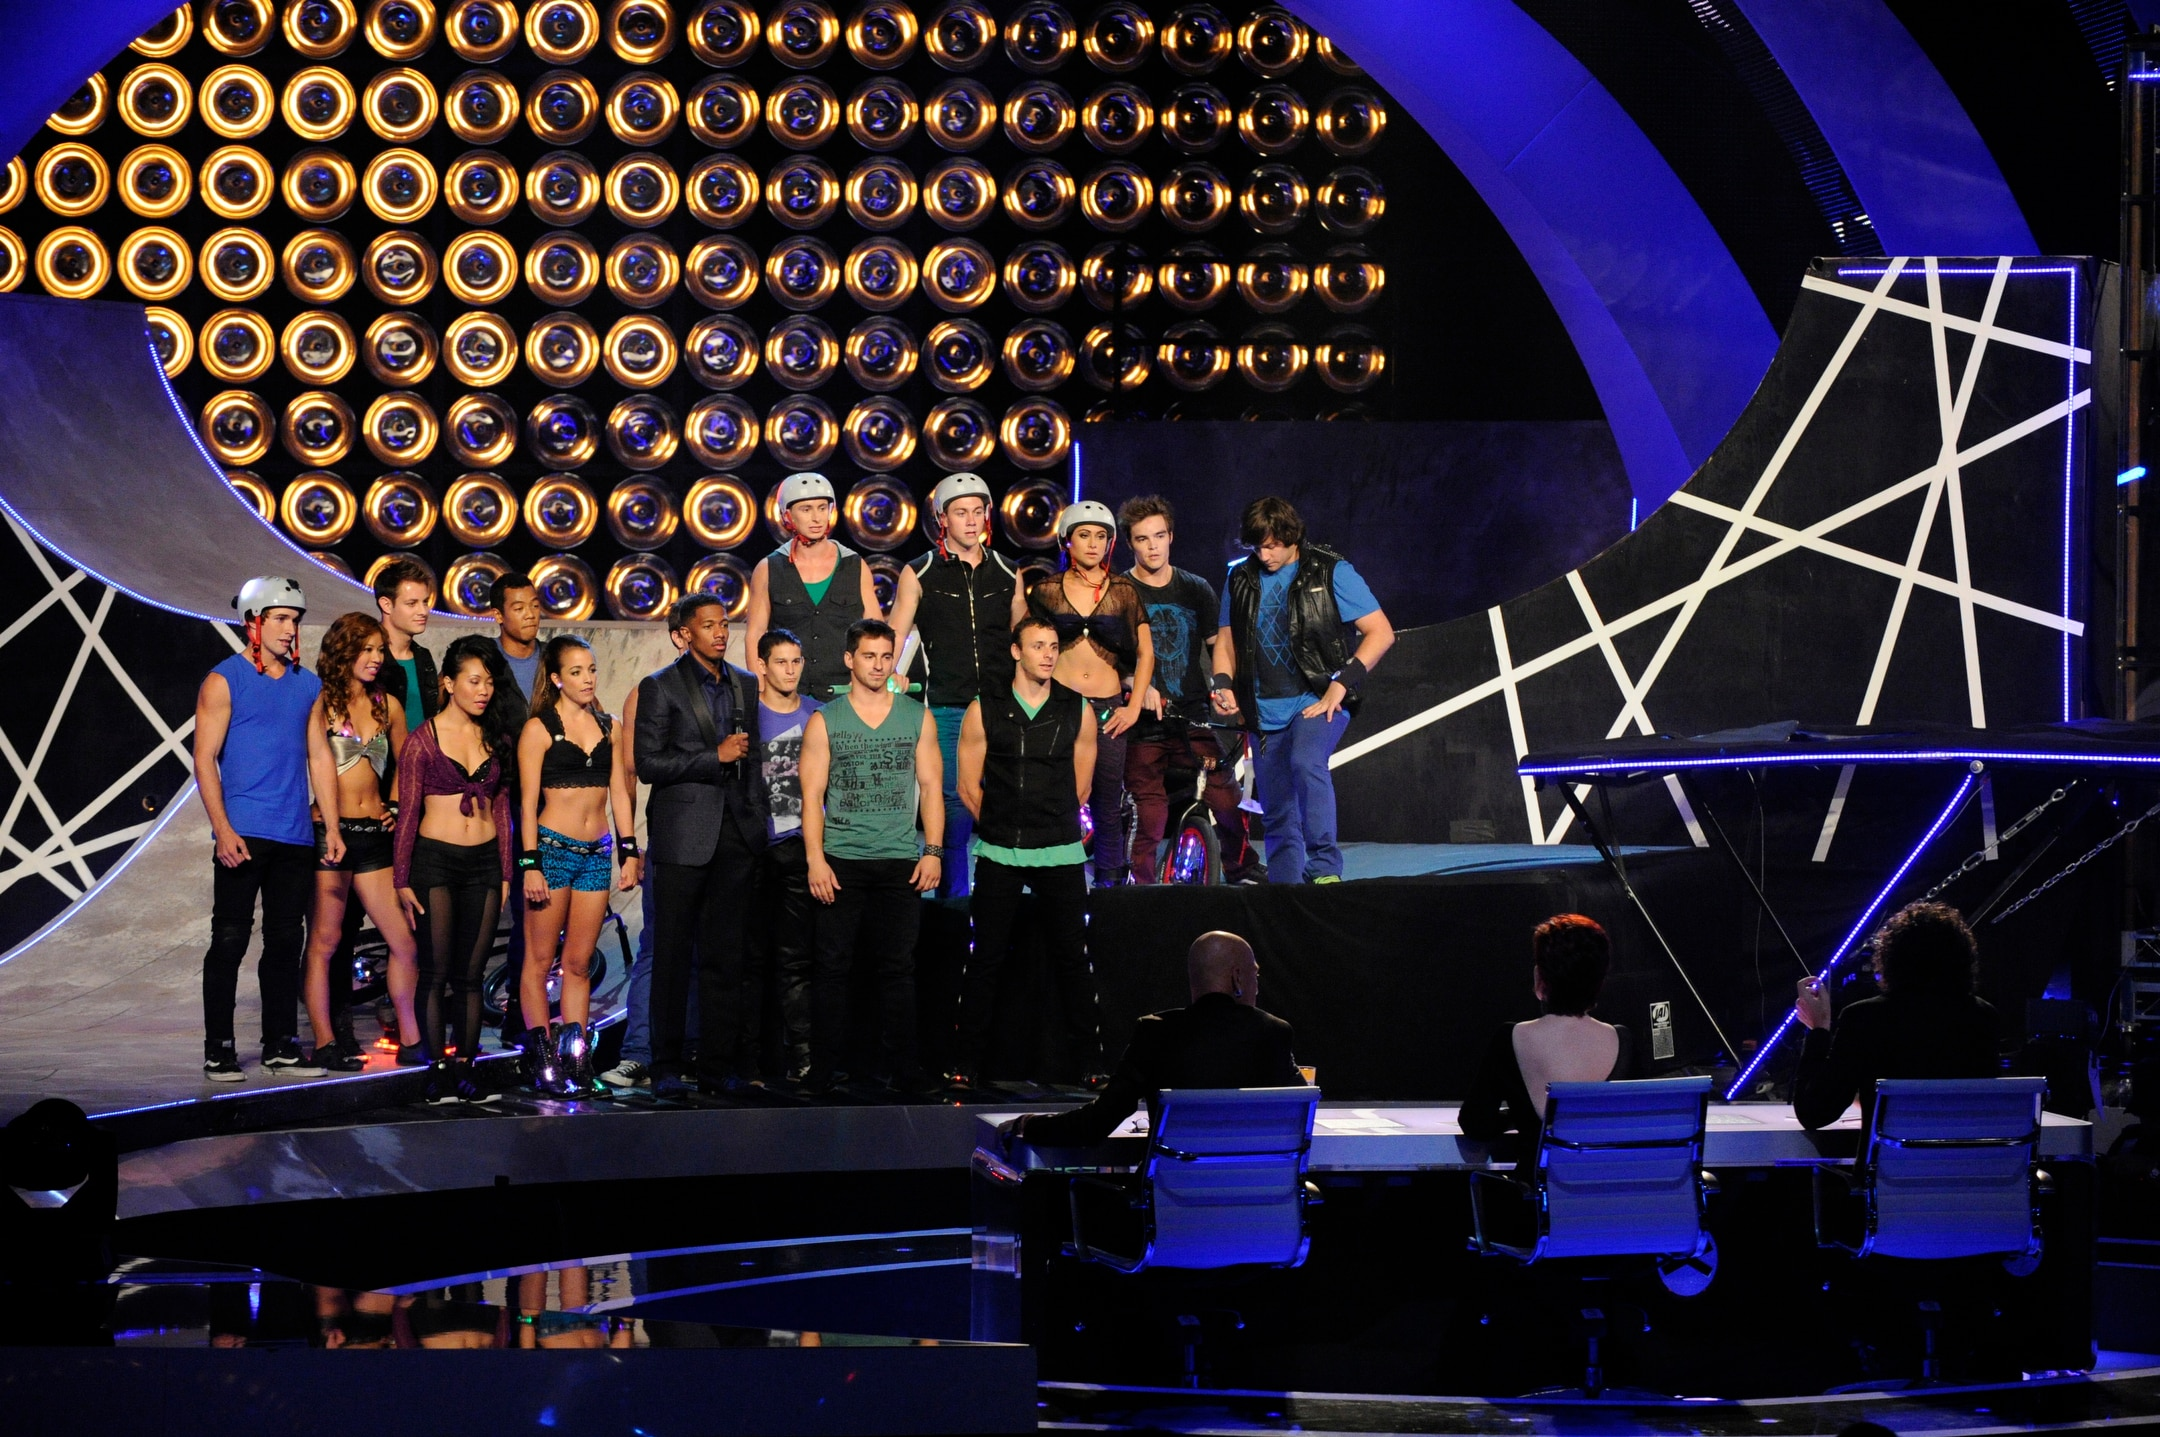 Americas Got Talent: Semifinals: Week 1 Performances